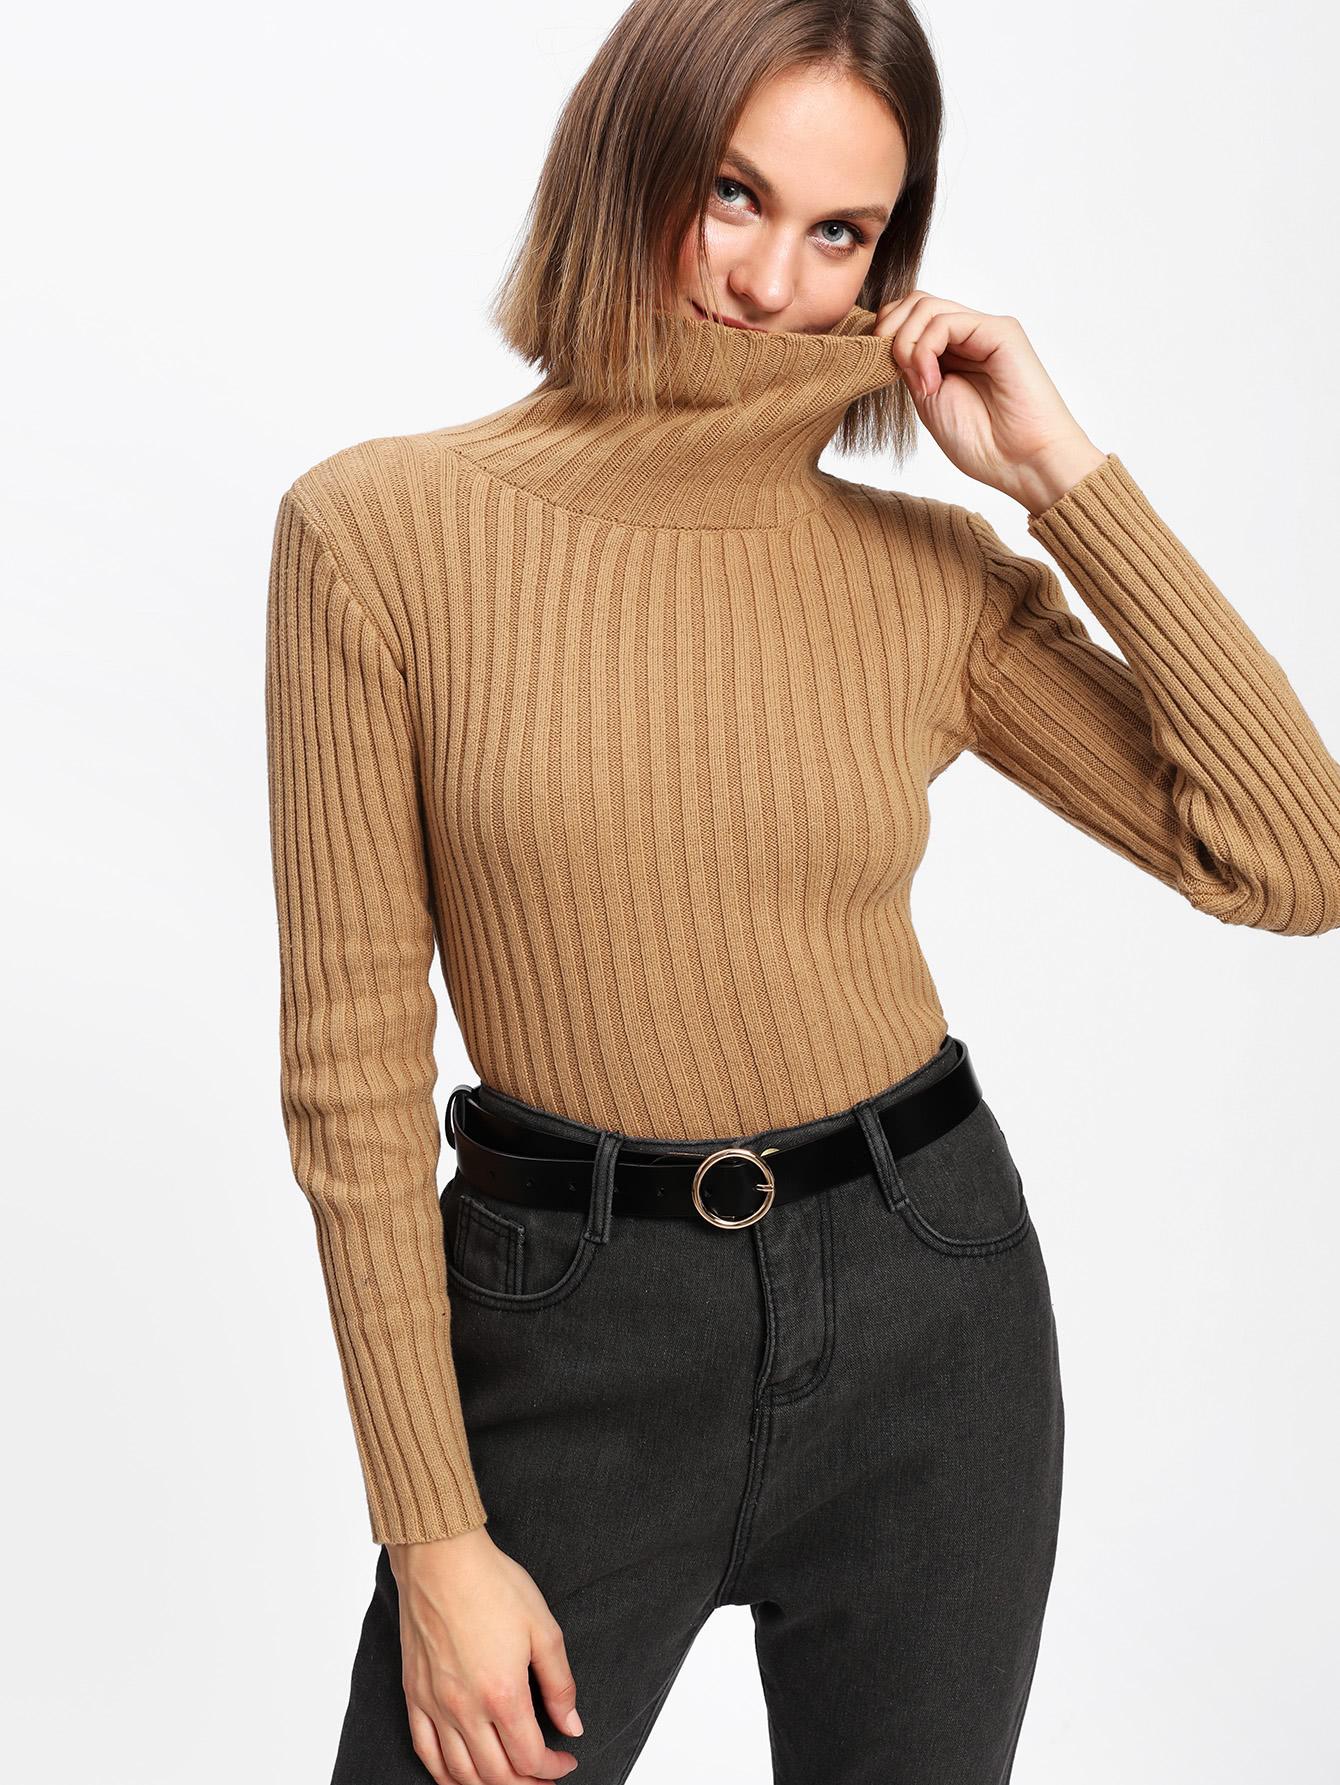 Rib Knit Turtleneck Sweater sweater171115202